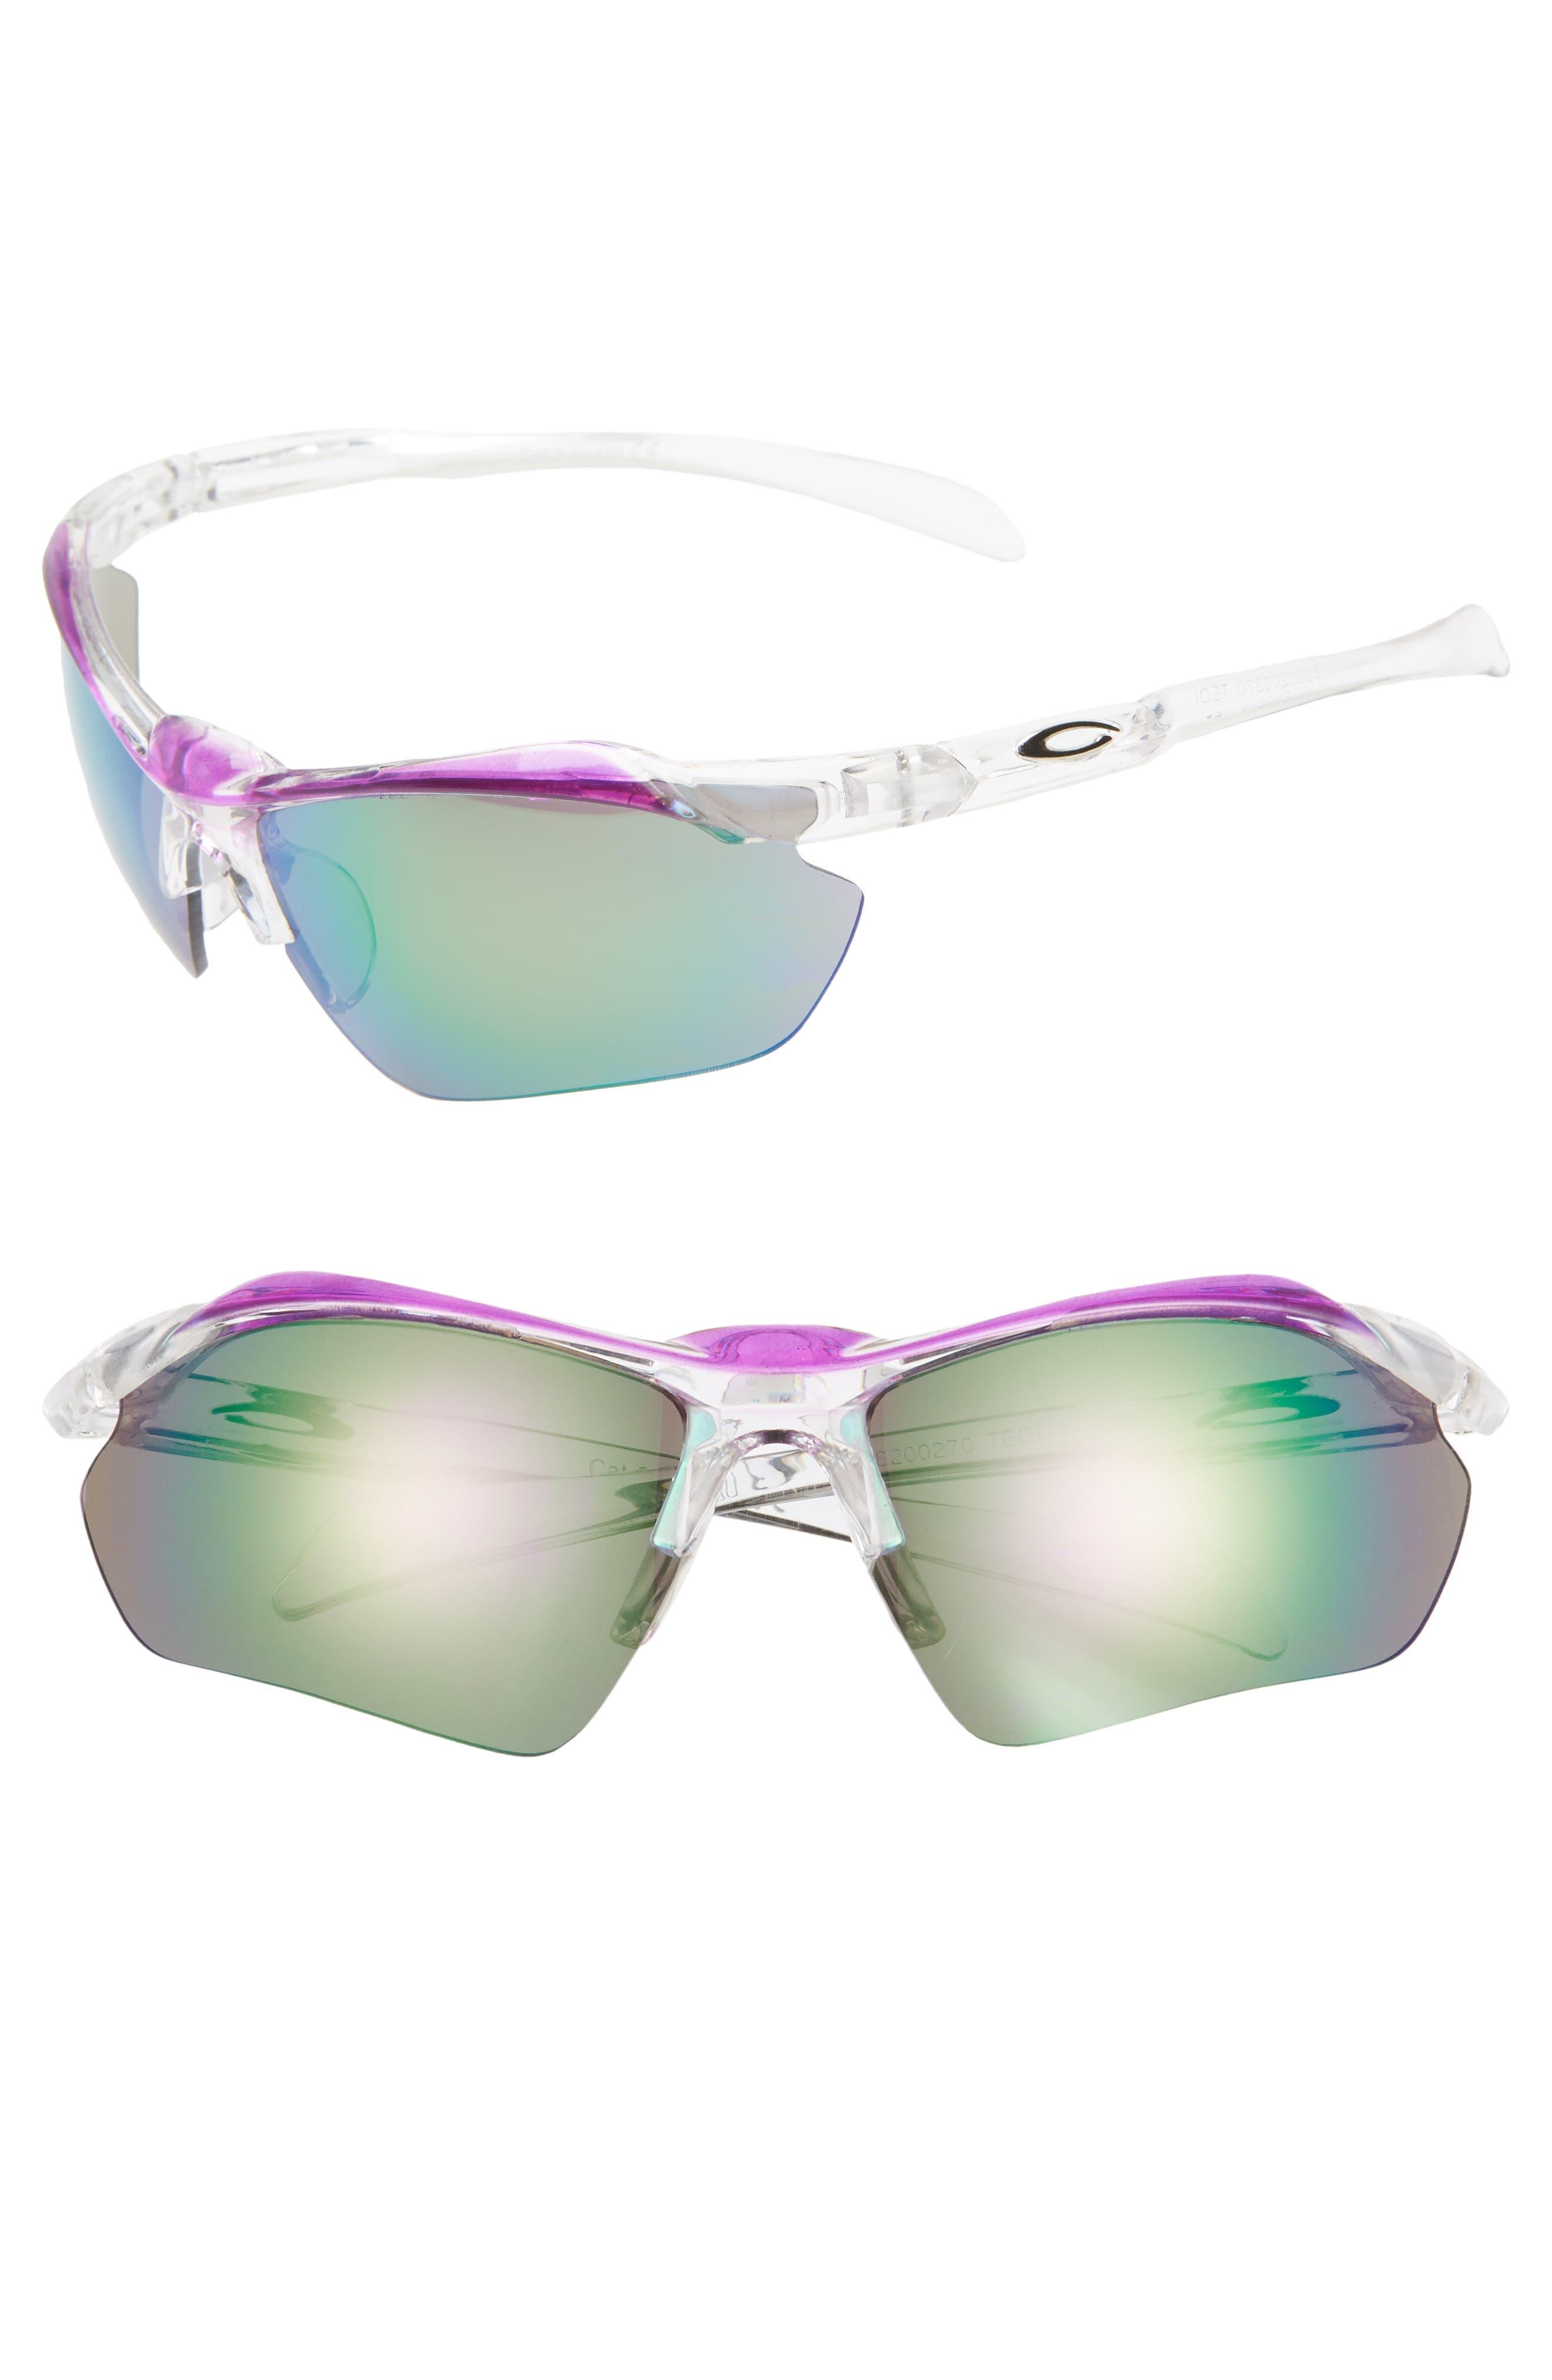 68mm Sport Shield Sunglasses, Main, color, CLEAR/ PURPLE